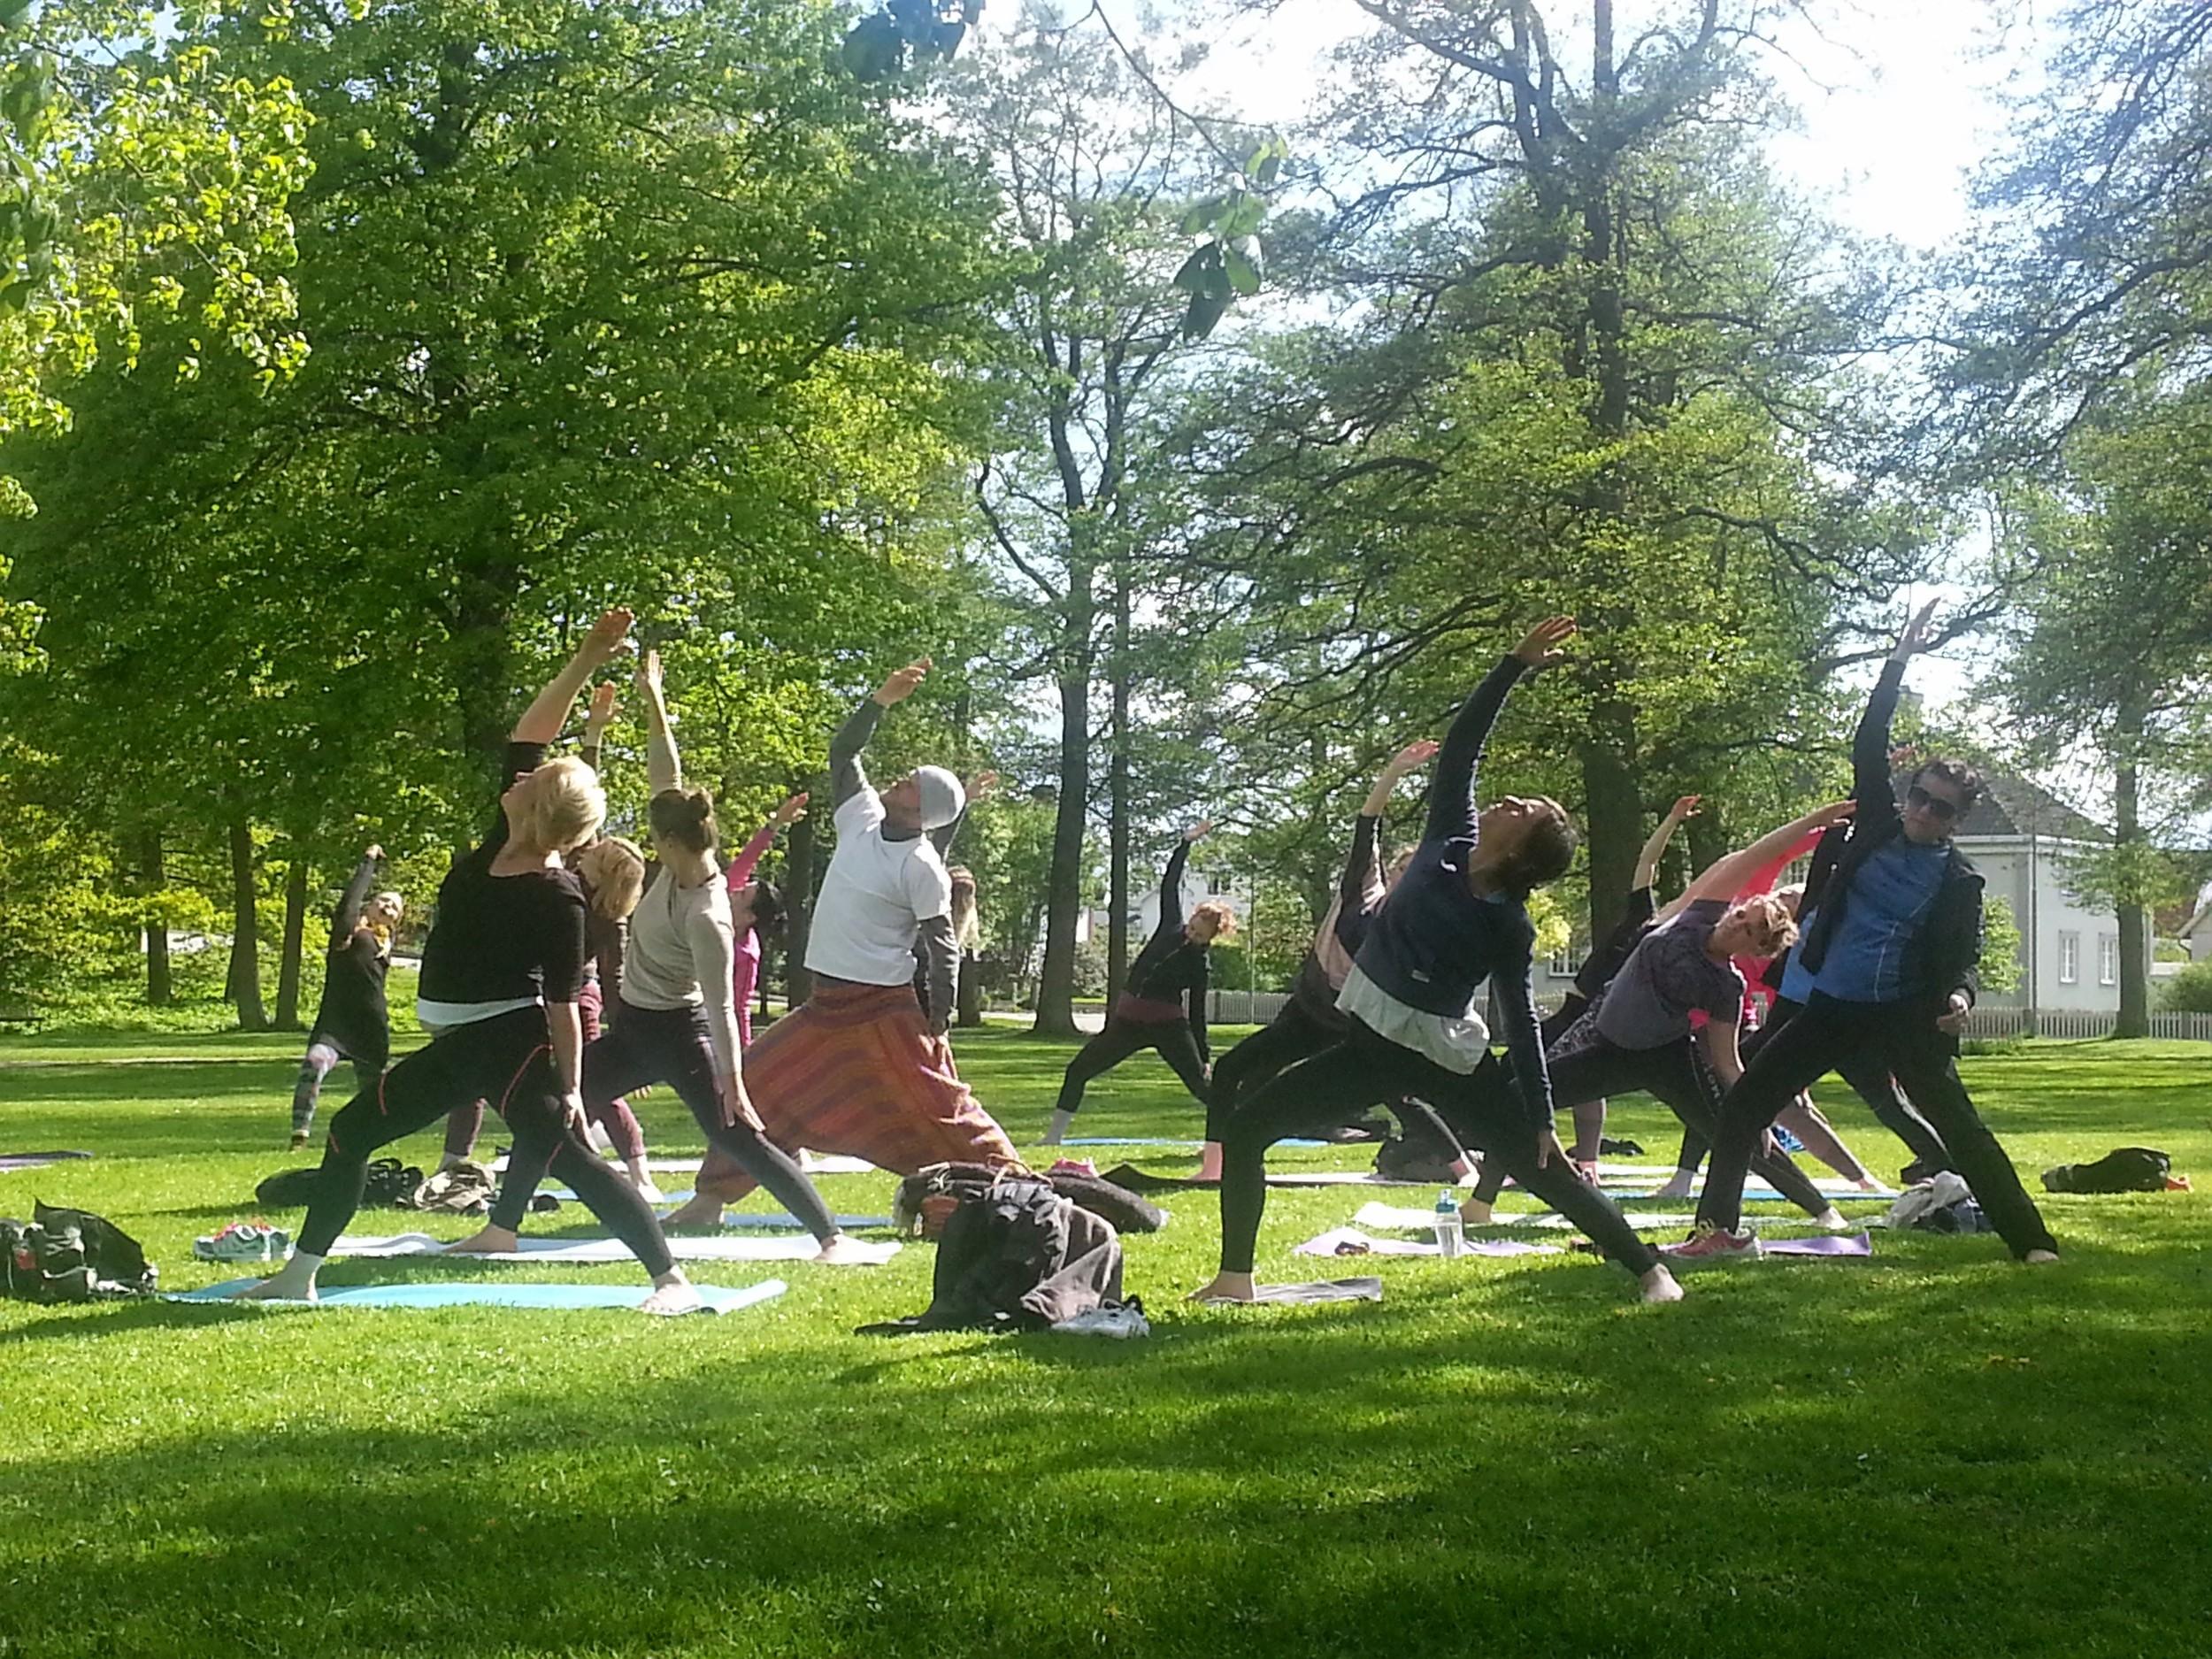 Flödande tid i Park Yoga, Växjö, Yoga By Magie. Photo: Anneli Eller, Copyright Service By Magie